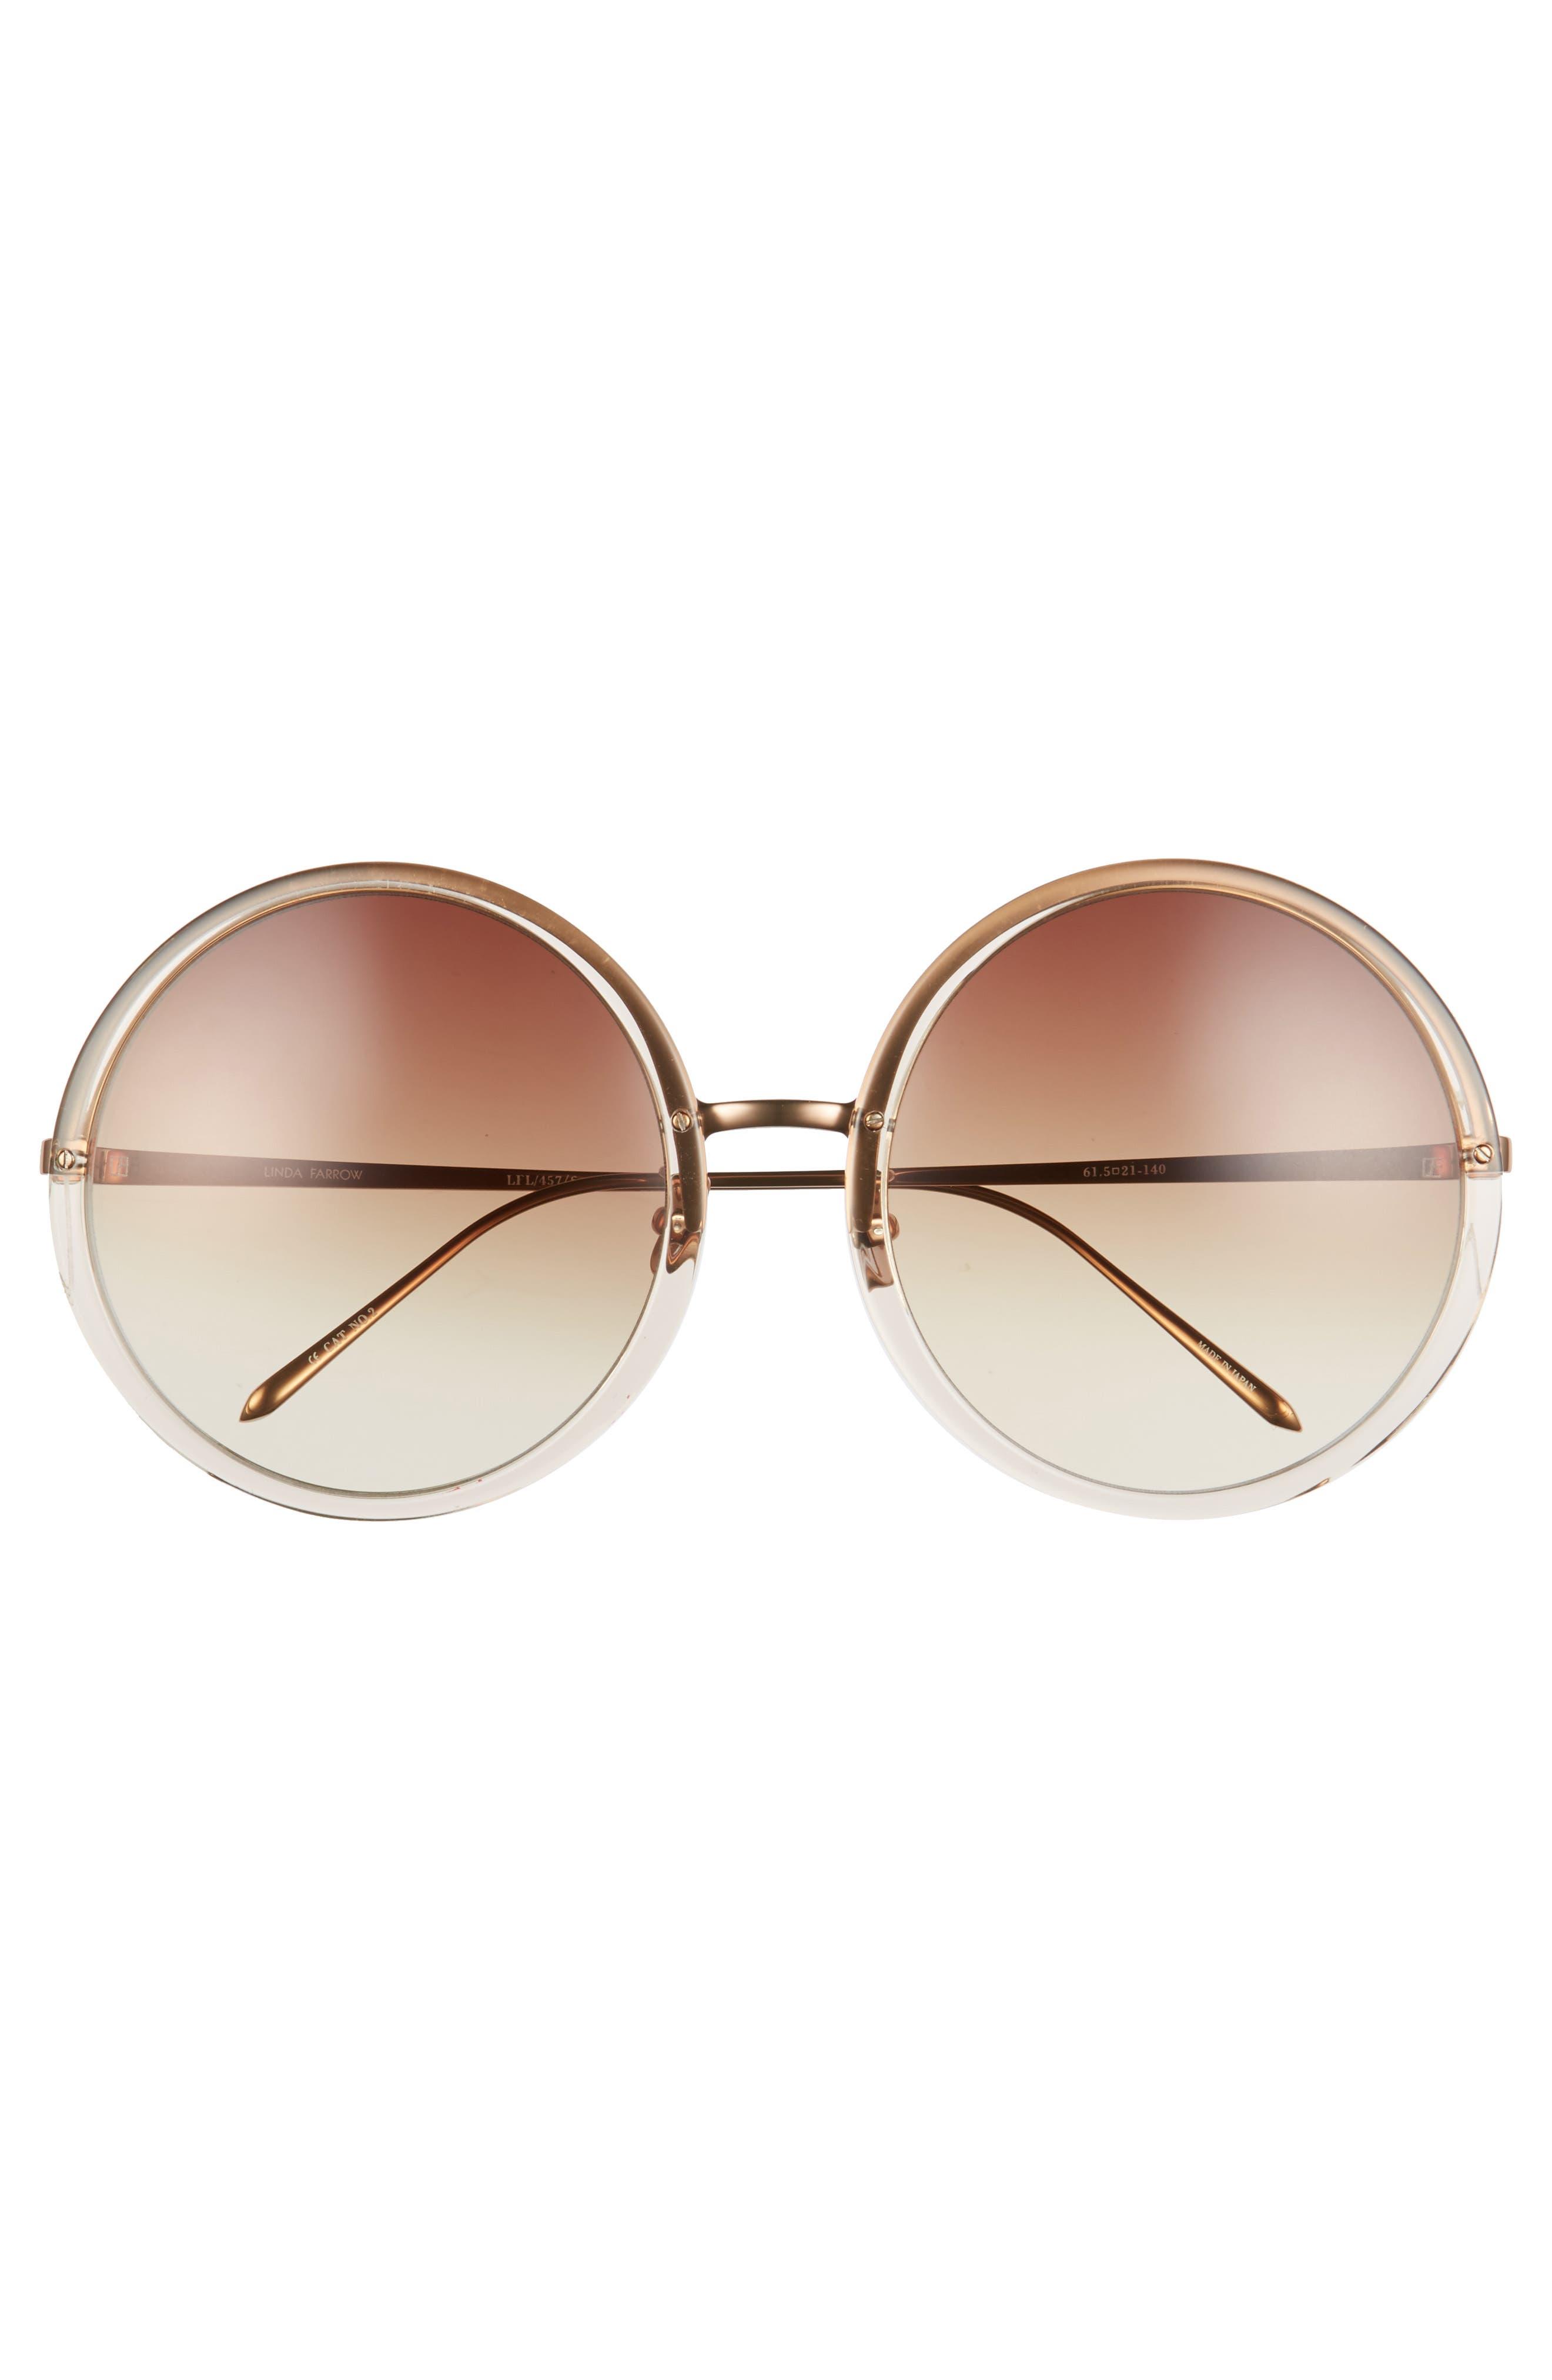 61mm Round 18 Karat Gold Trim Sunglasses,                             Alternate thumbnail 3, color,                             020